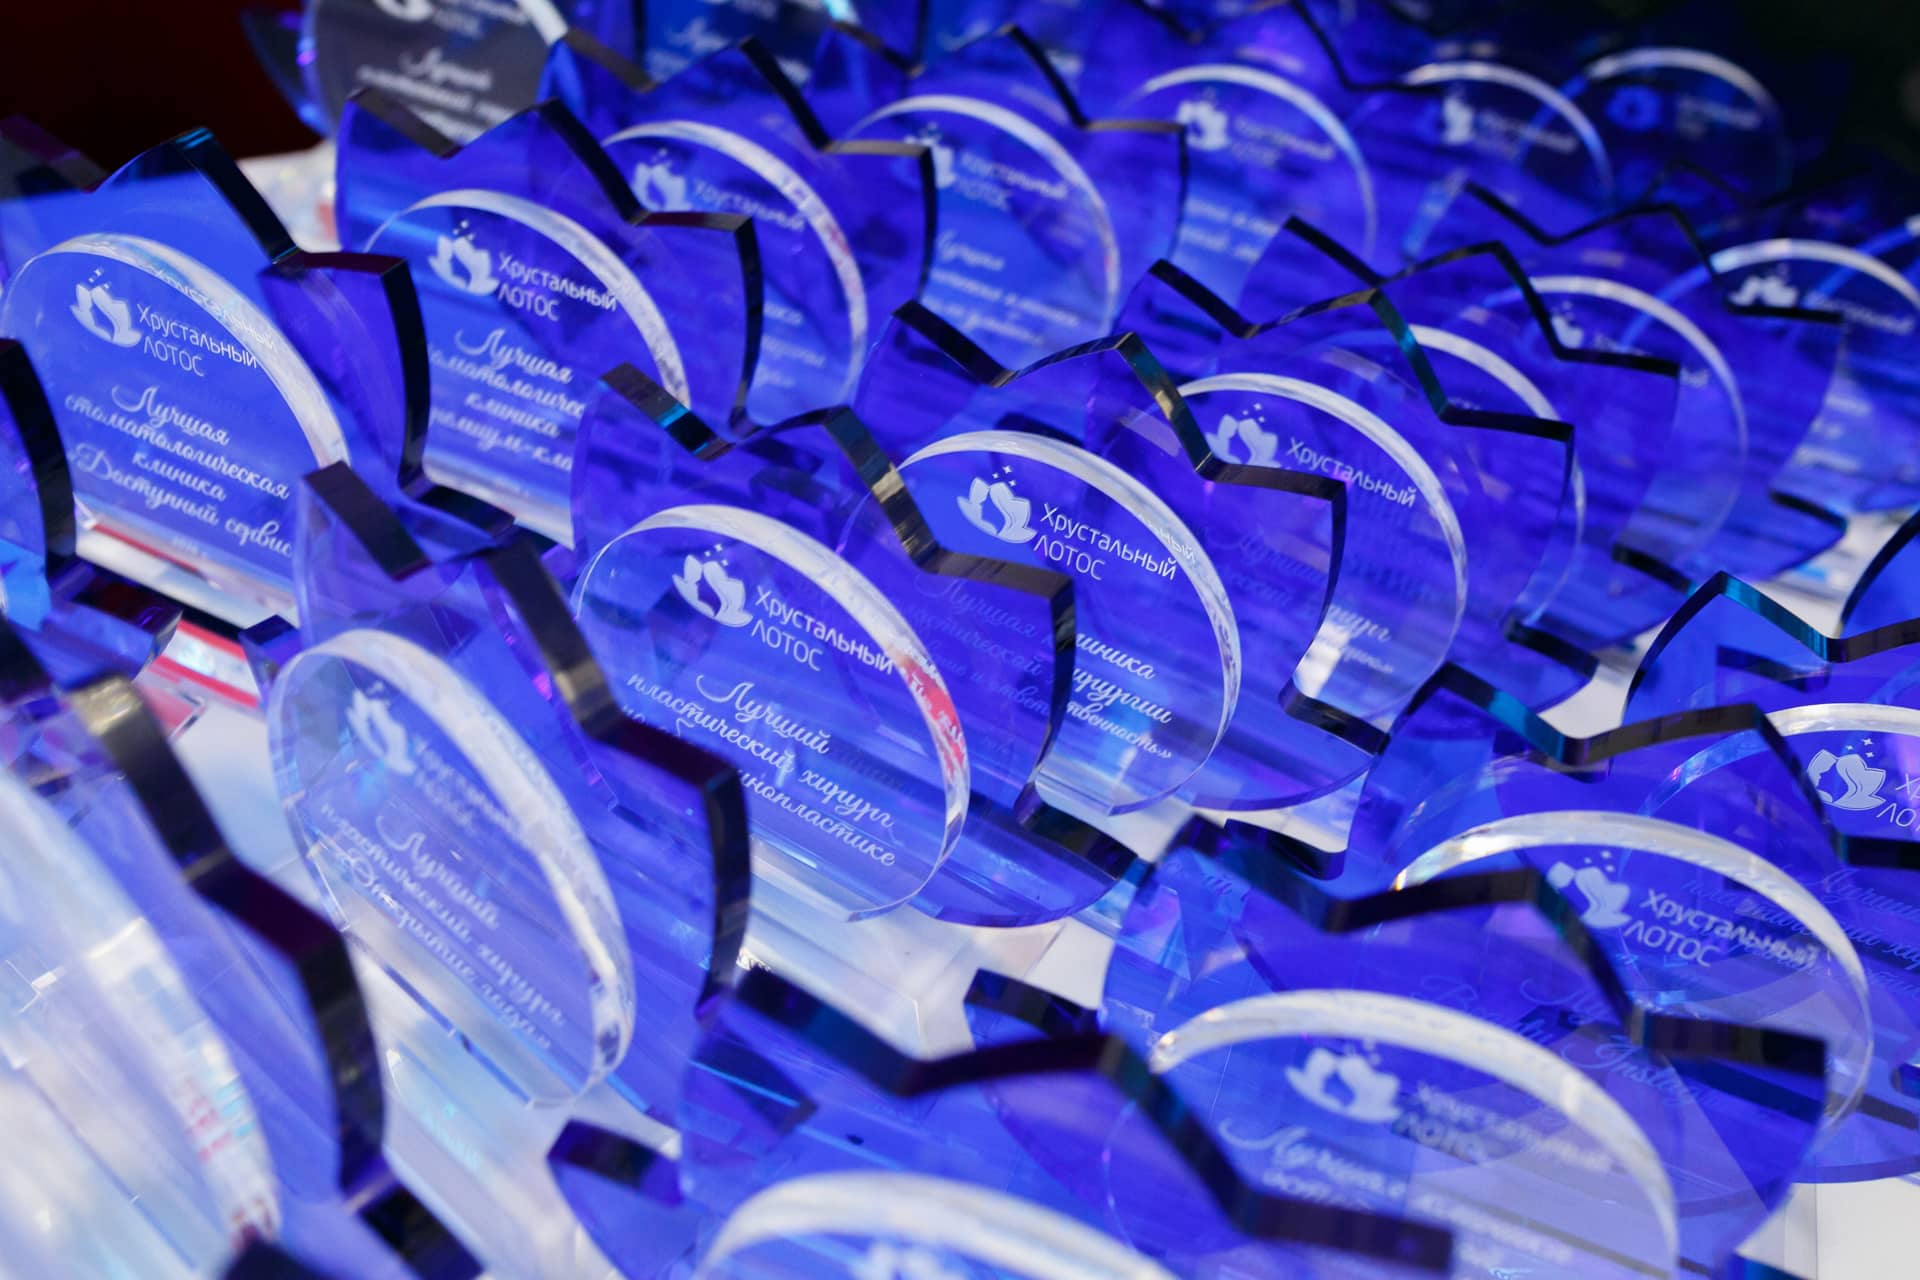 Премия года | пластический хирург